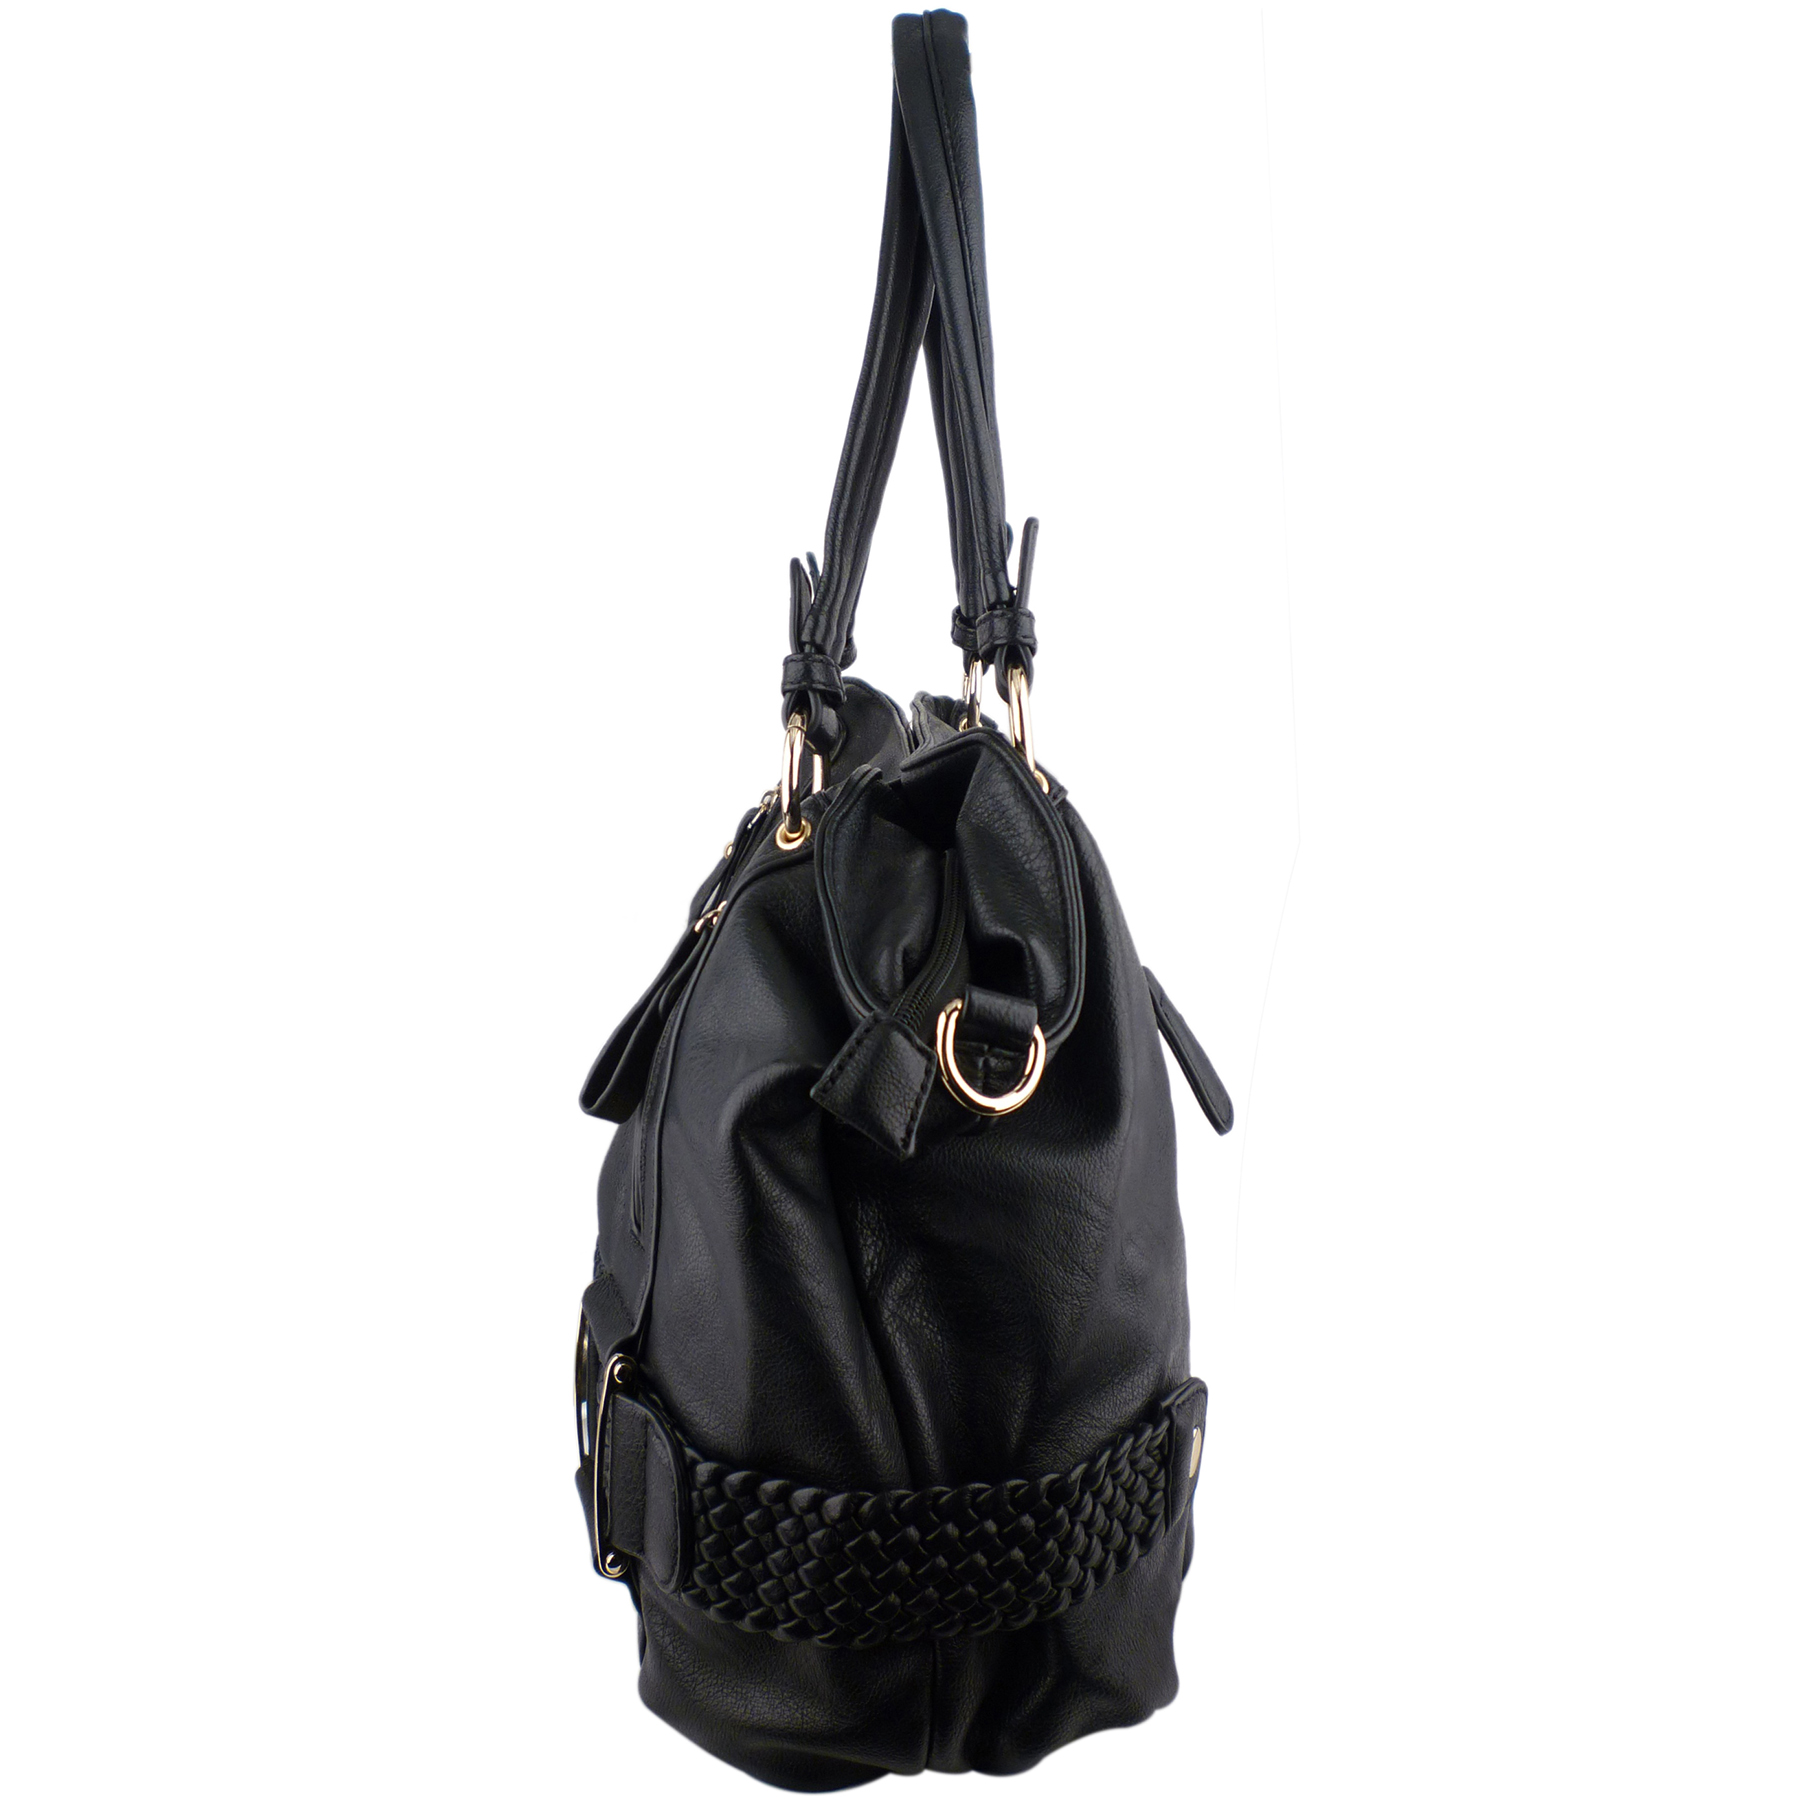 MG Collection Hobo's - SAMANTHA Black Weave Pattern Soft Hobo Handbag Side